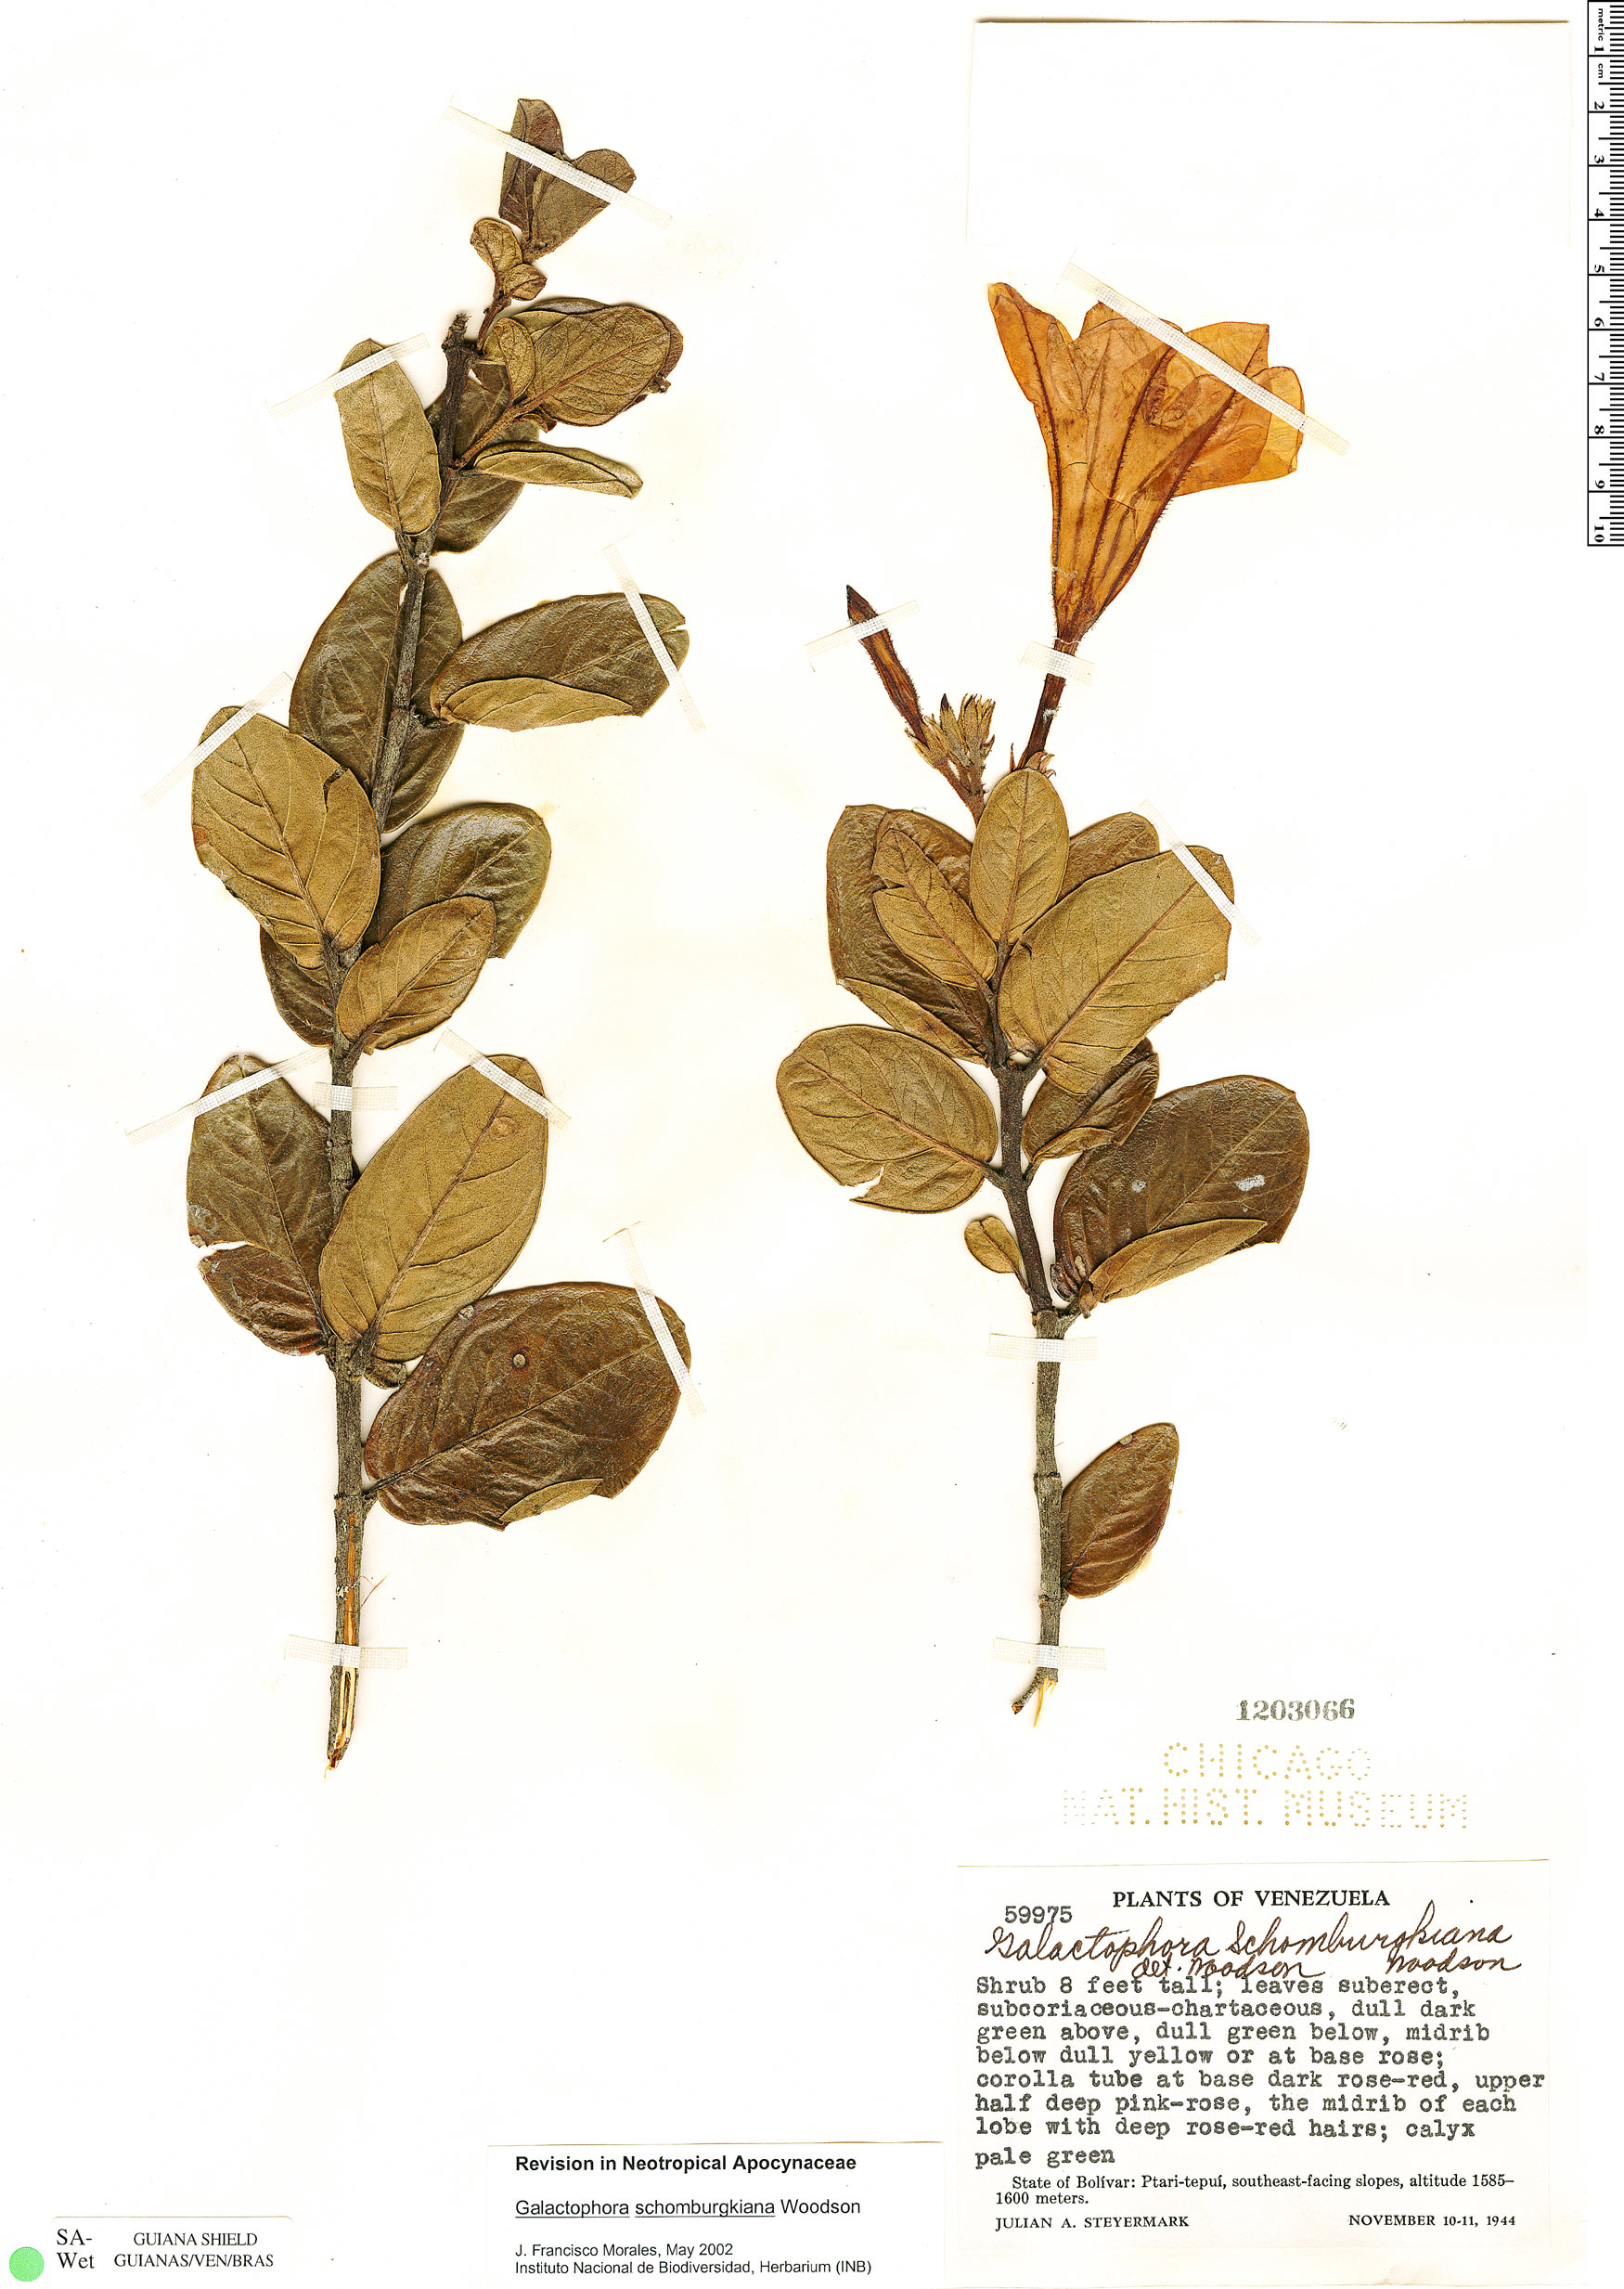 Espécimen: Galactophora schomburgkiana